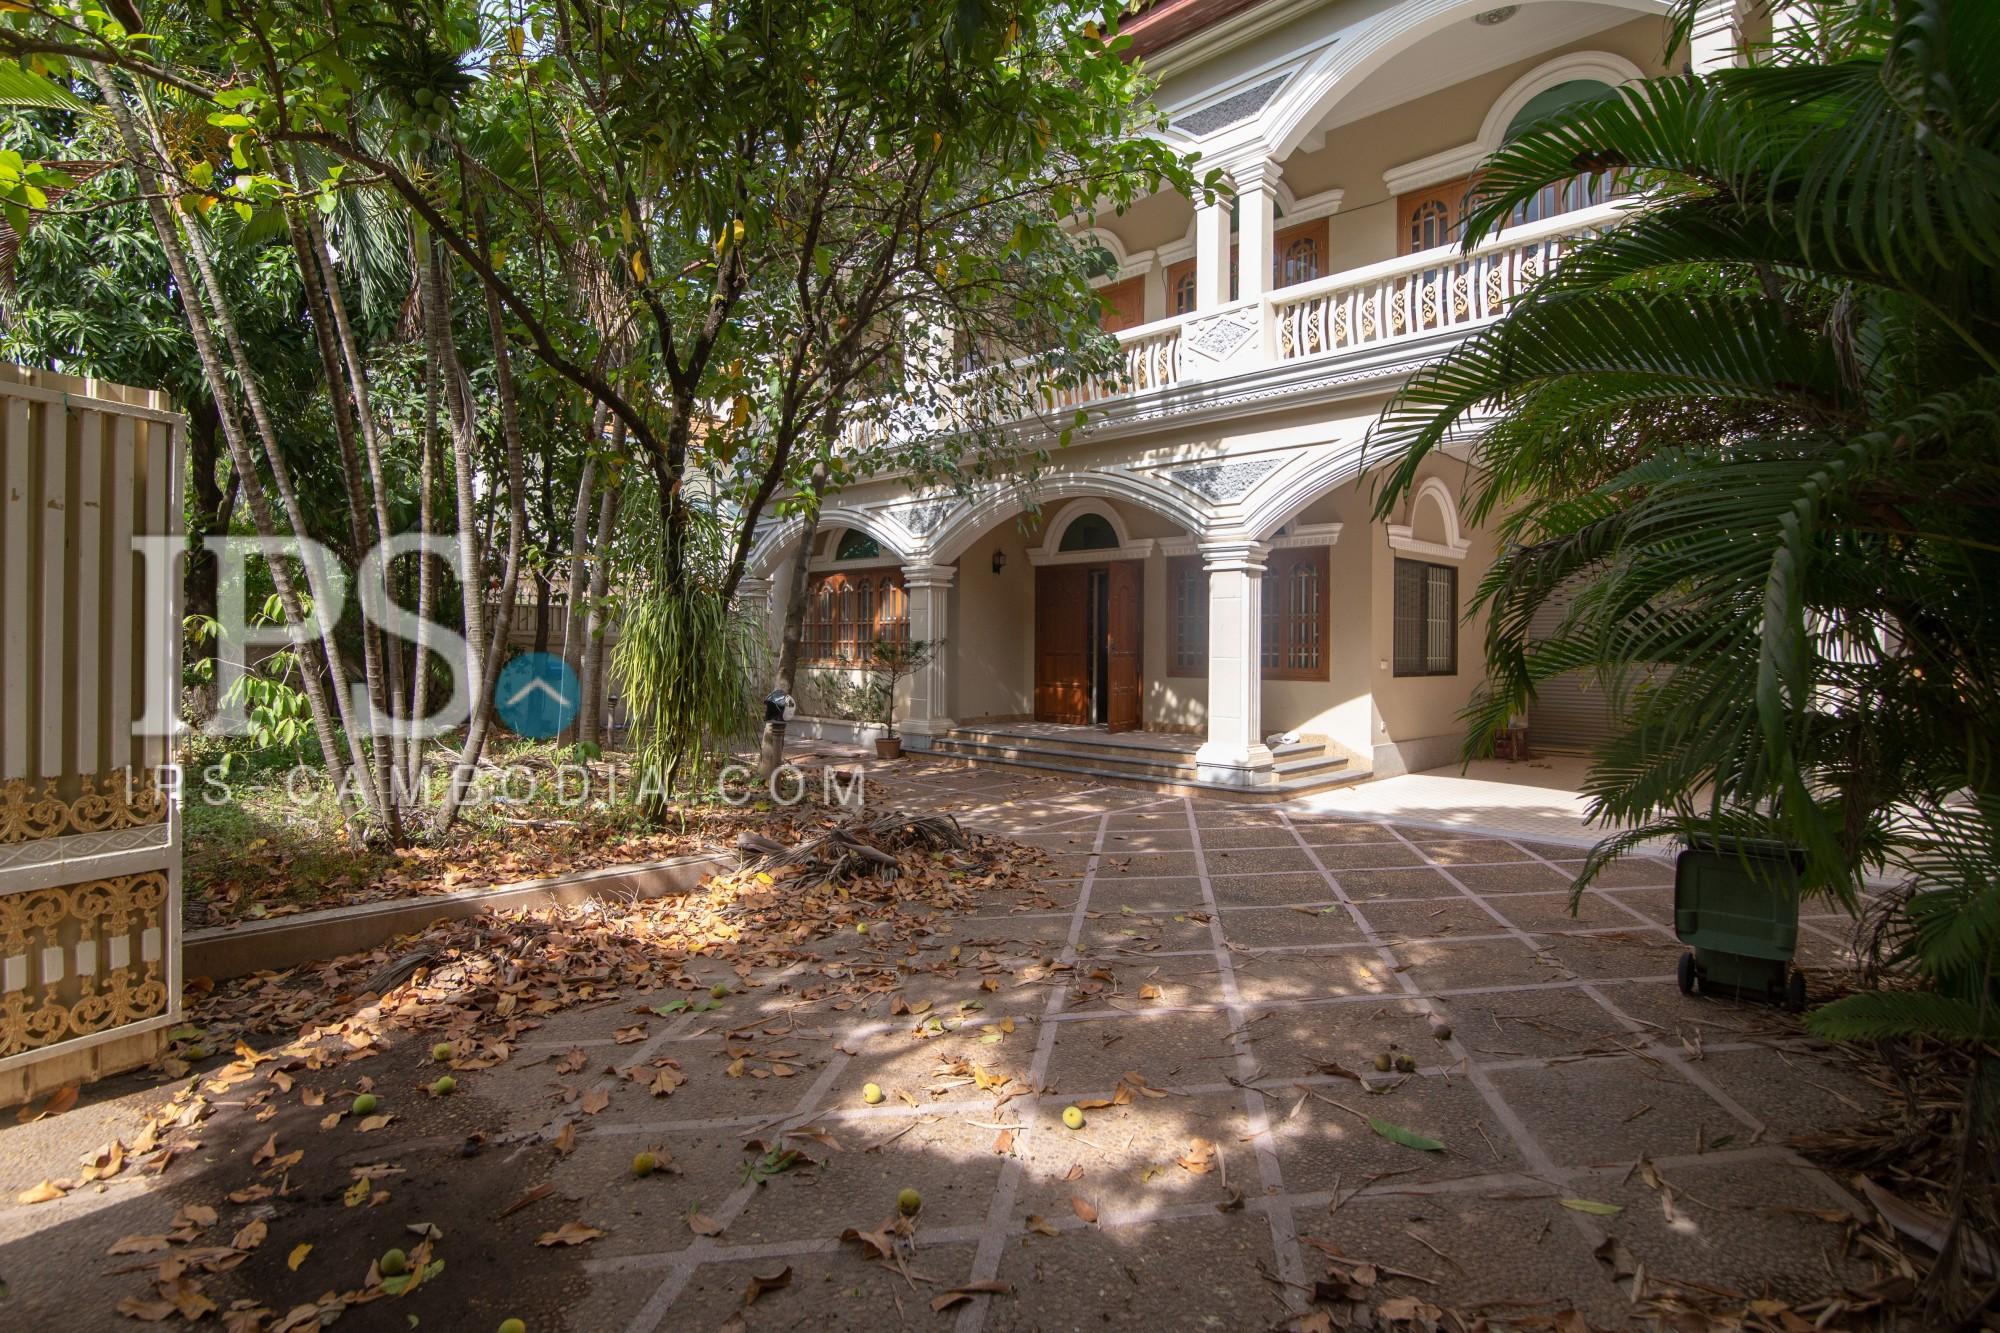 6 Bedroom Villa For Rent - Tonle Bassac, Phnom Penh